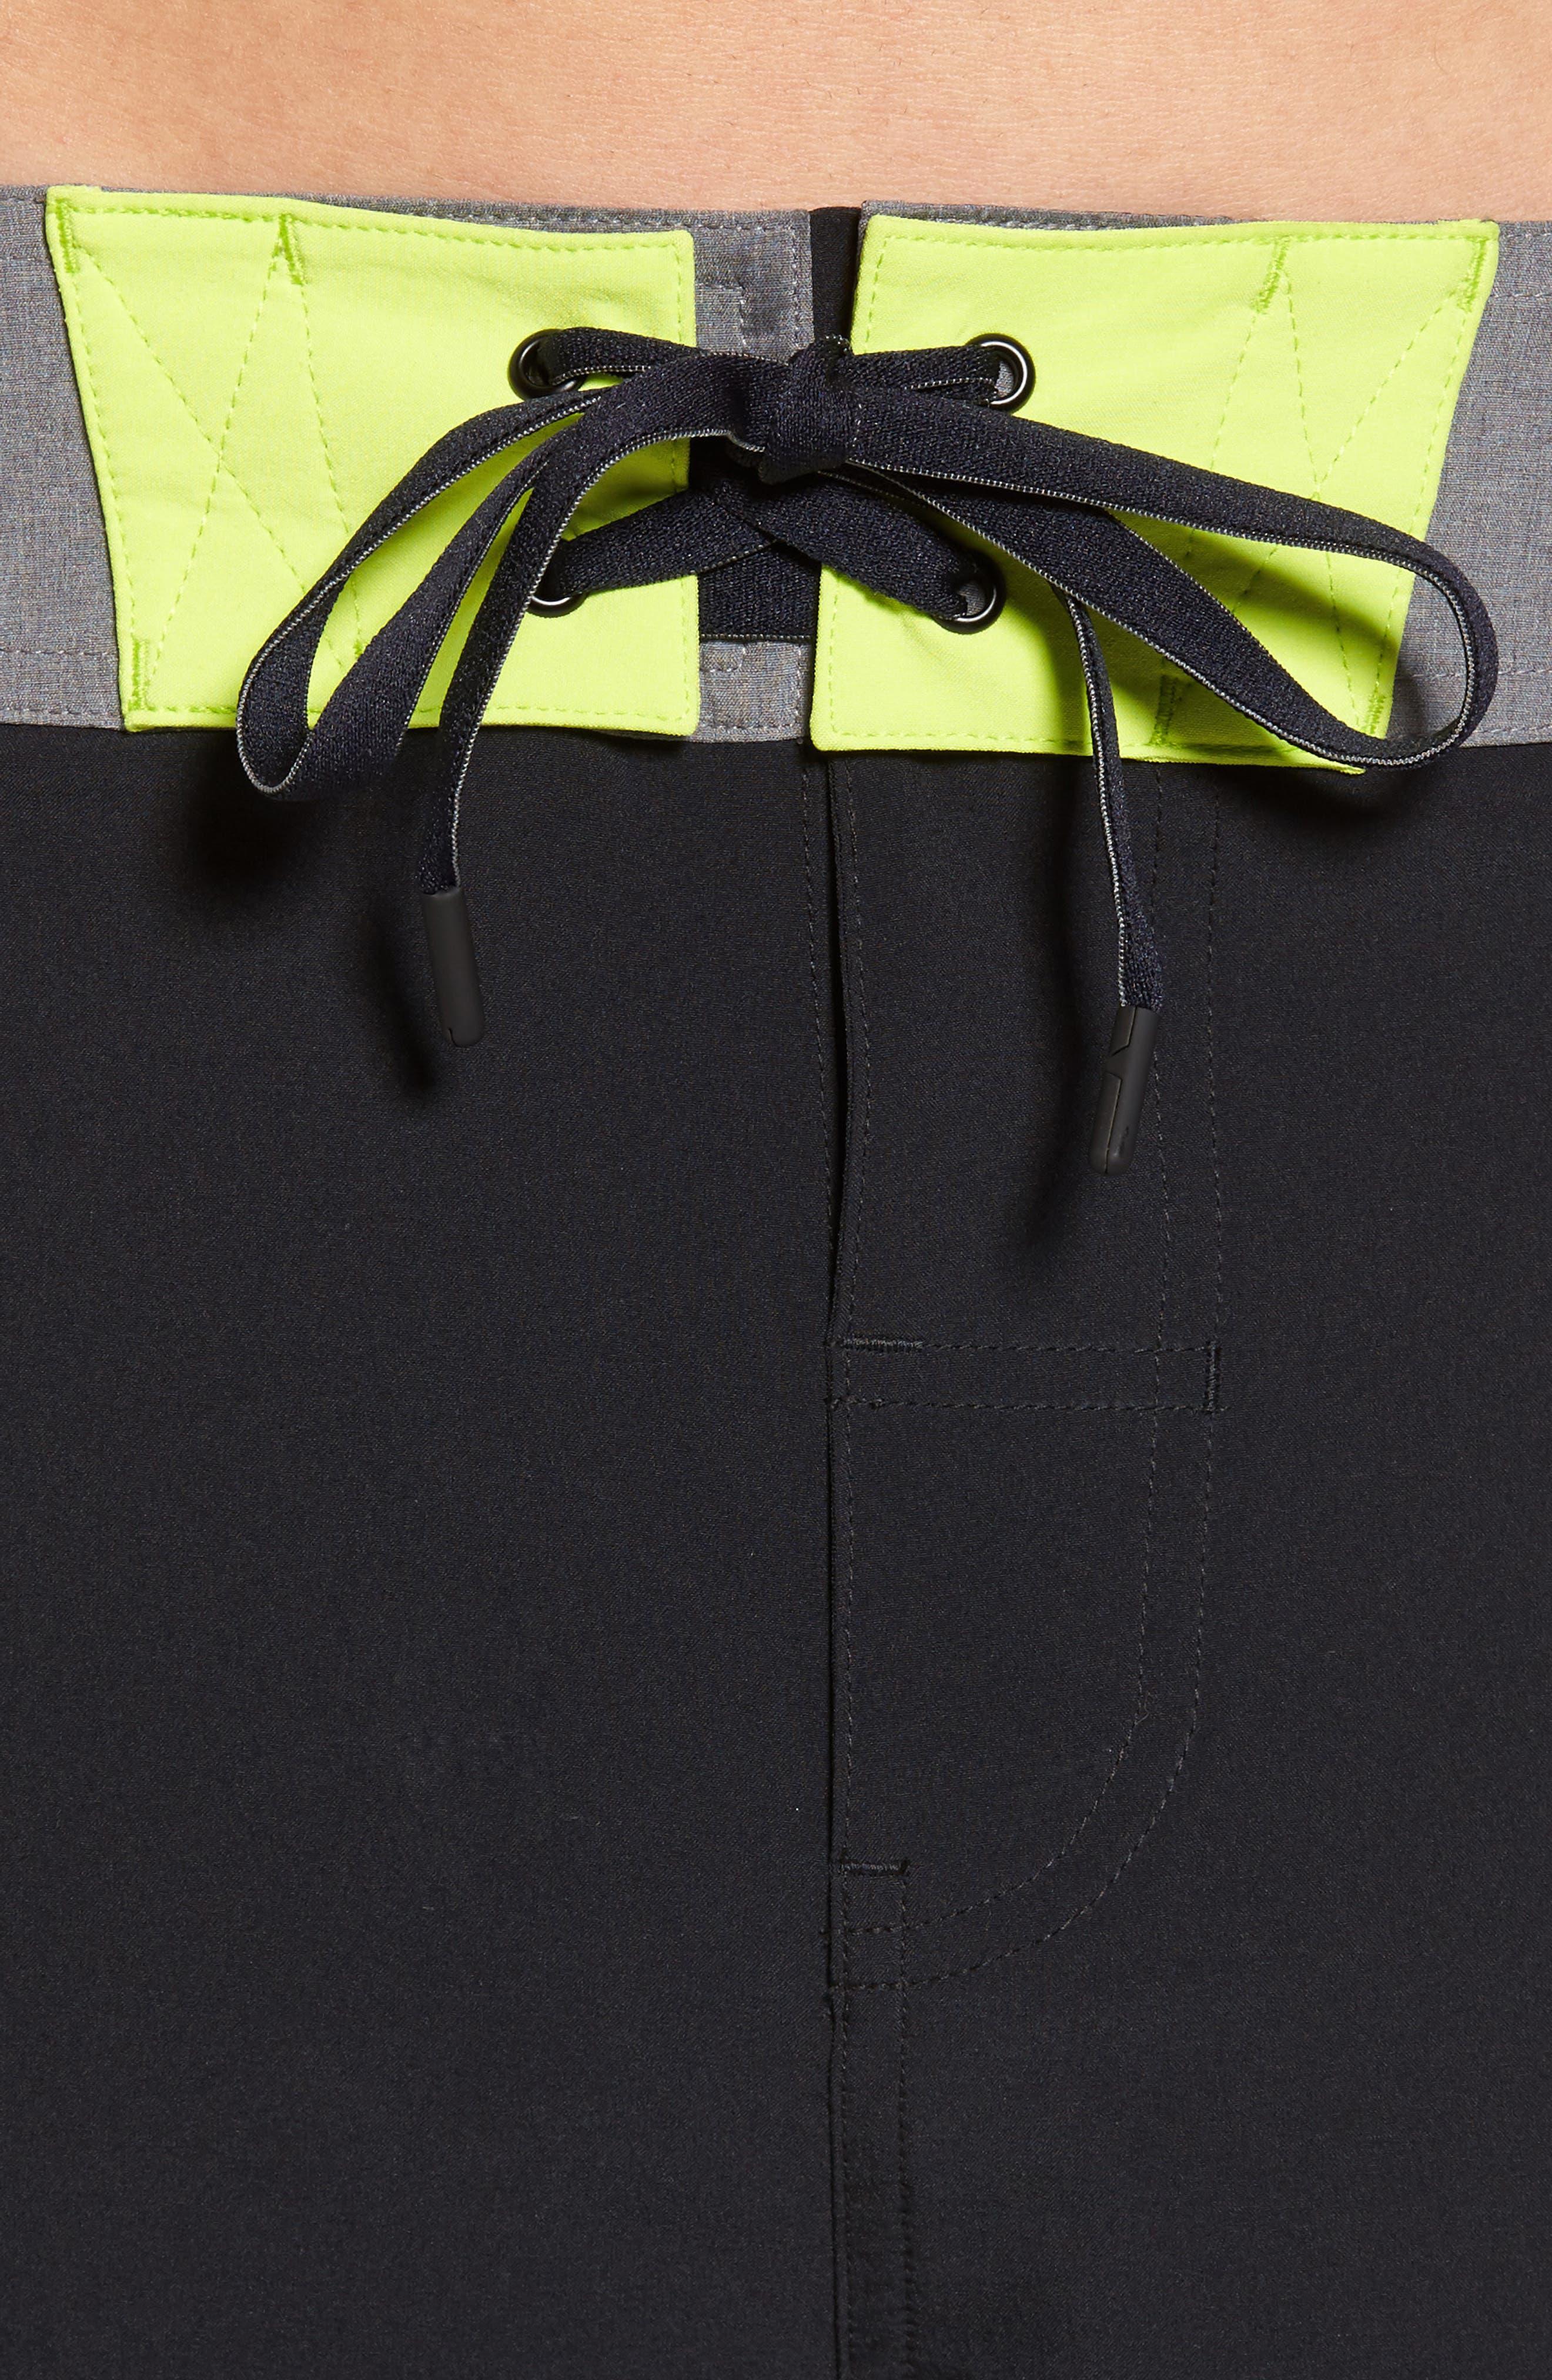 Flex Hybrid Athletic Shorts,                             Alternate thumbnail 4, color,                             Black